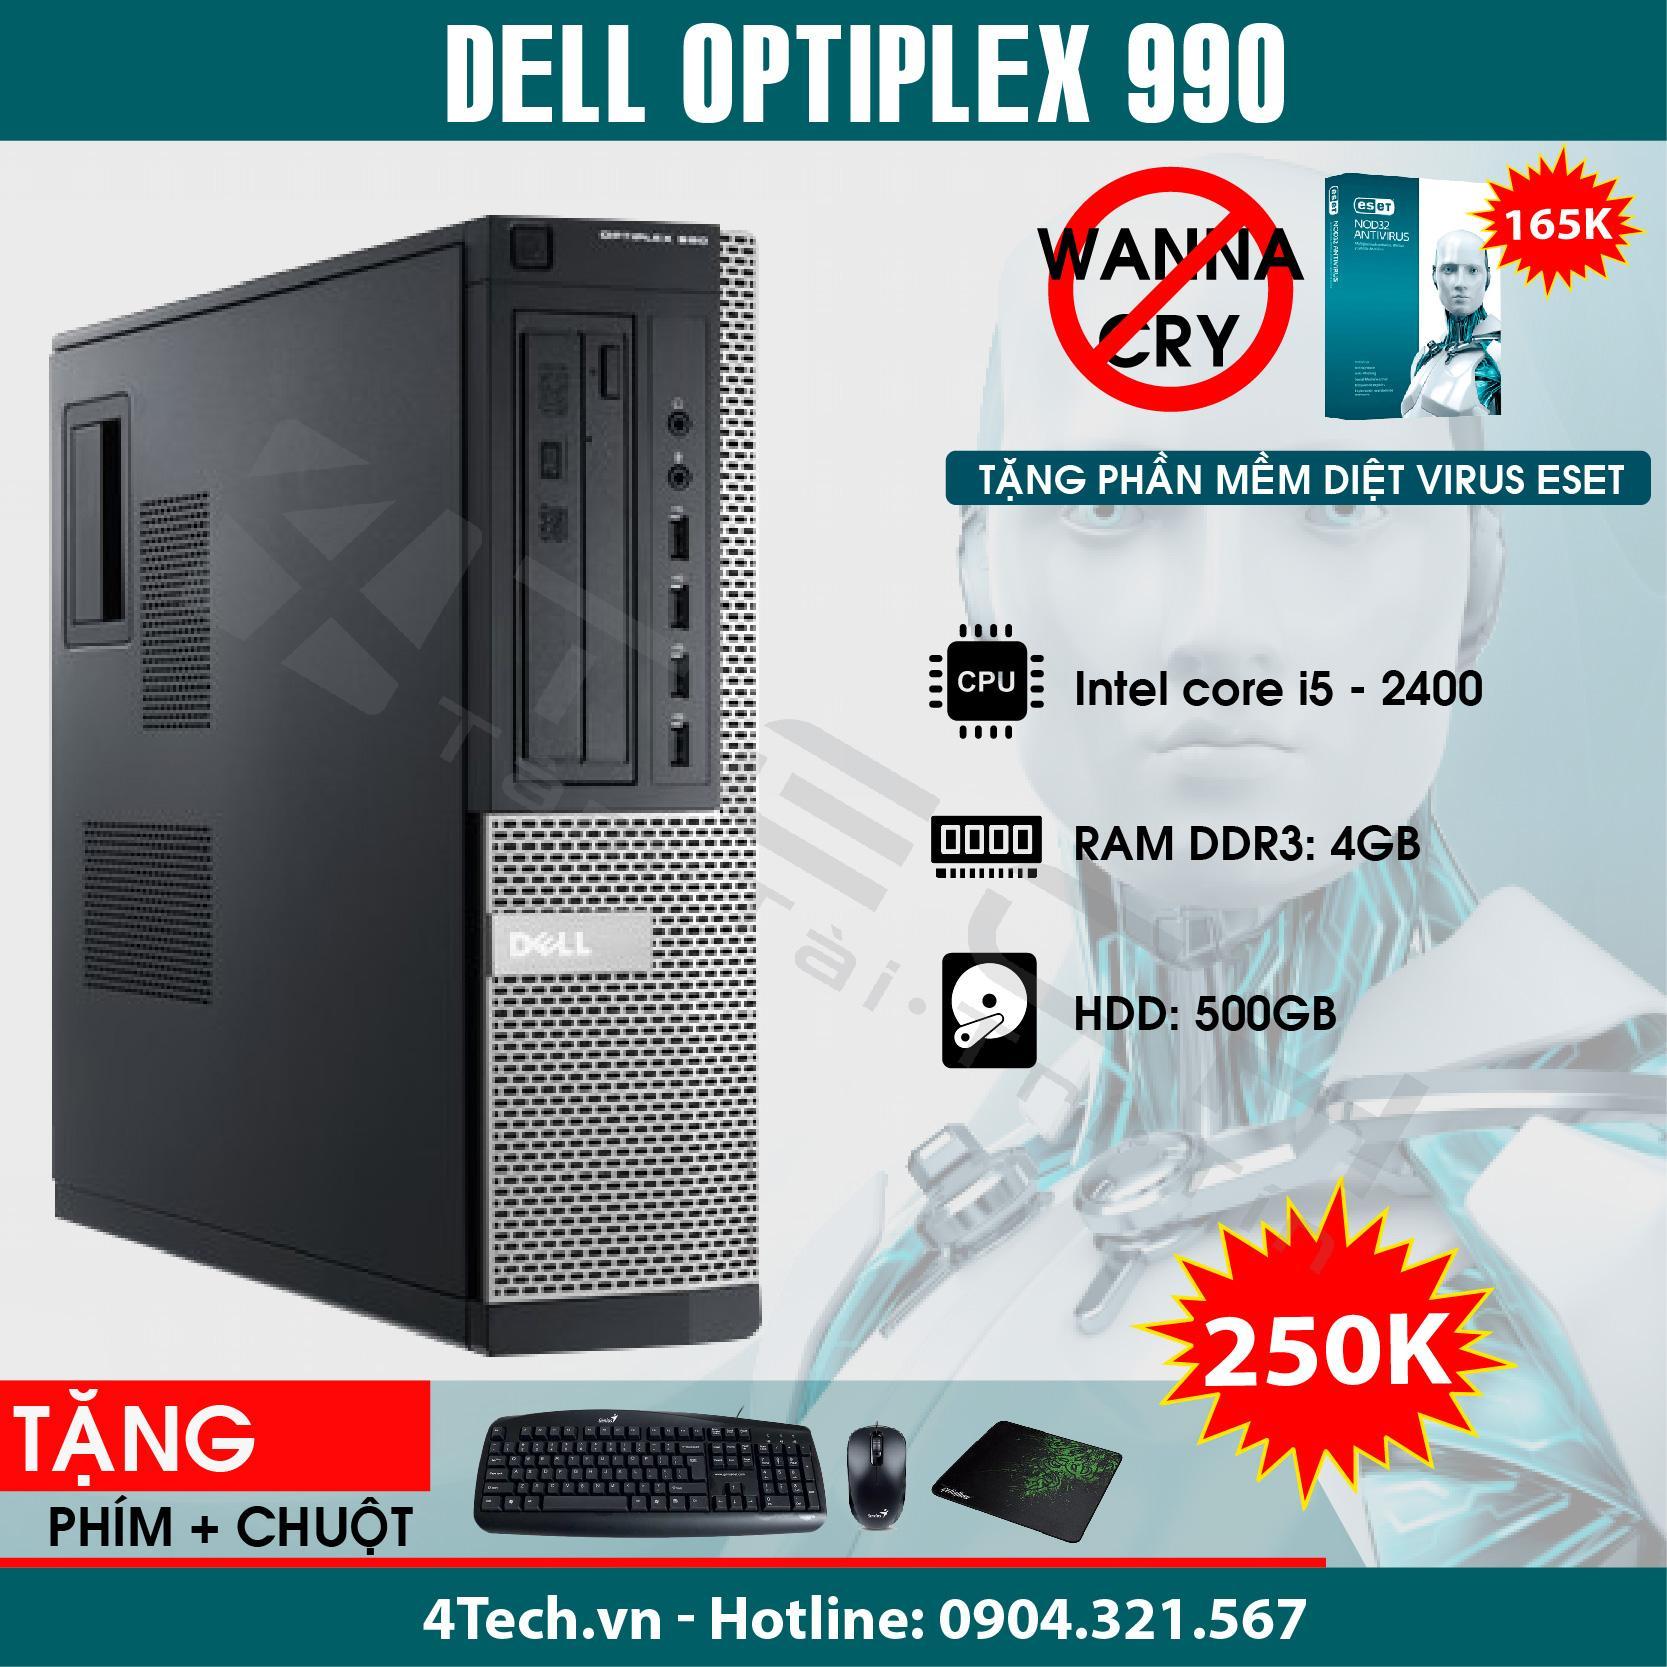 Máy Tính Đồng Bộ Dell Optiplex 990 Intel Core i5-2400, Ram 4GB, HDD 500GB - Mua 1 Tặng 10.